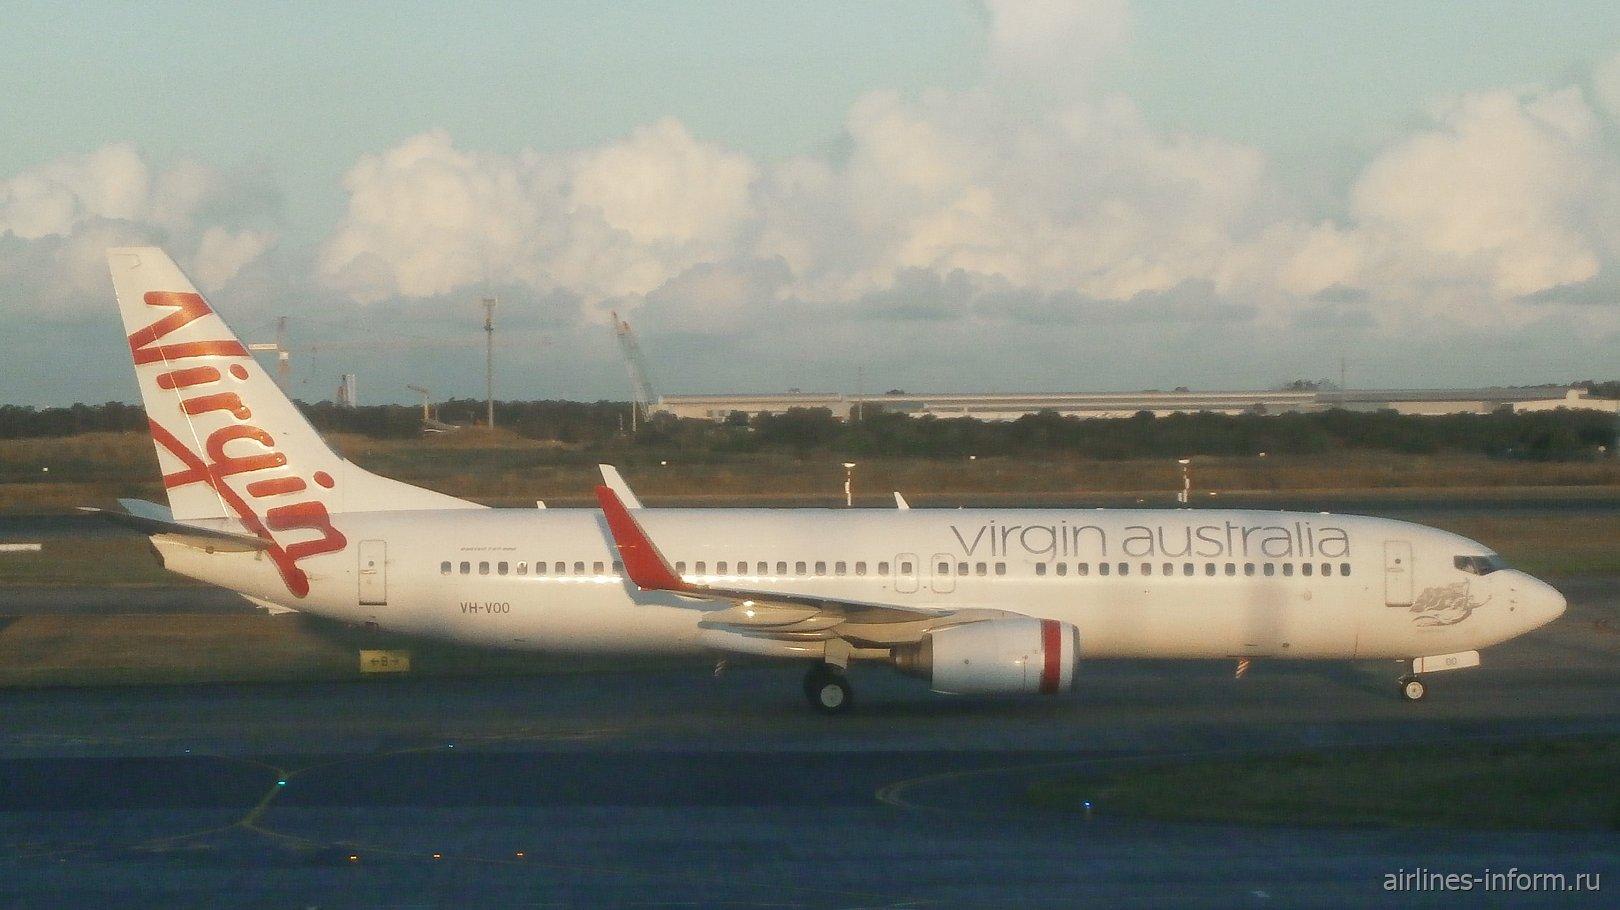 Virgin Australia B737-800 VH-VOO, Brisbane Airport, 4 June 2018